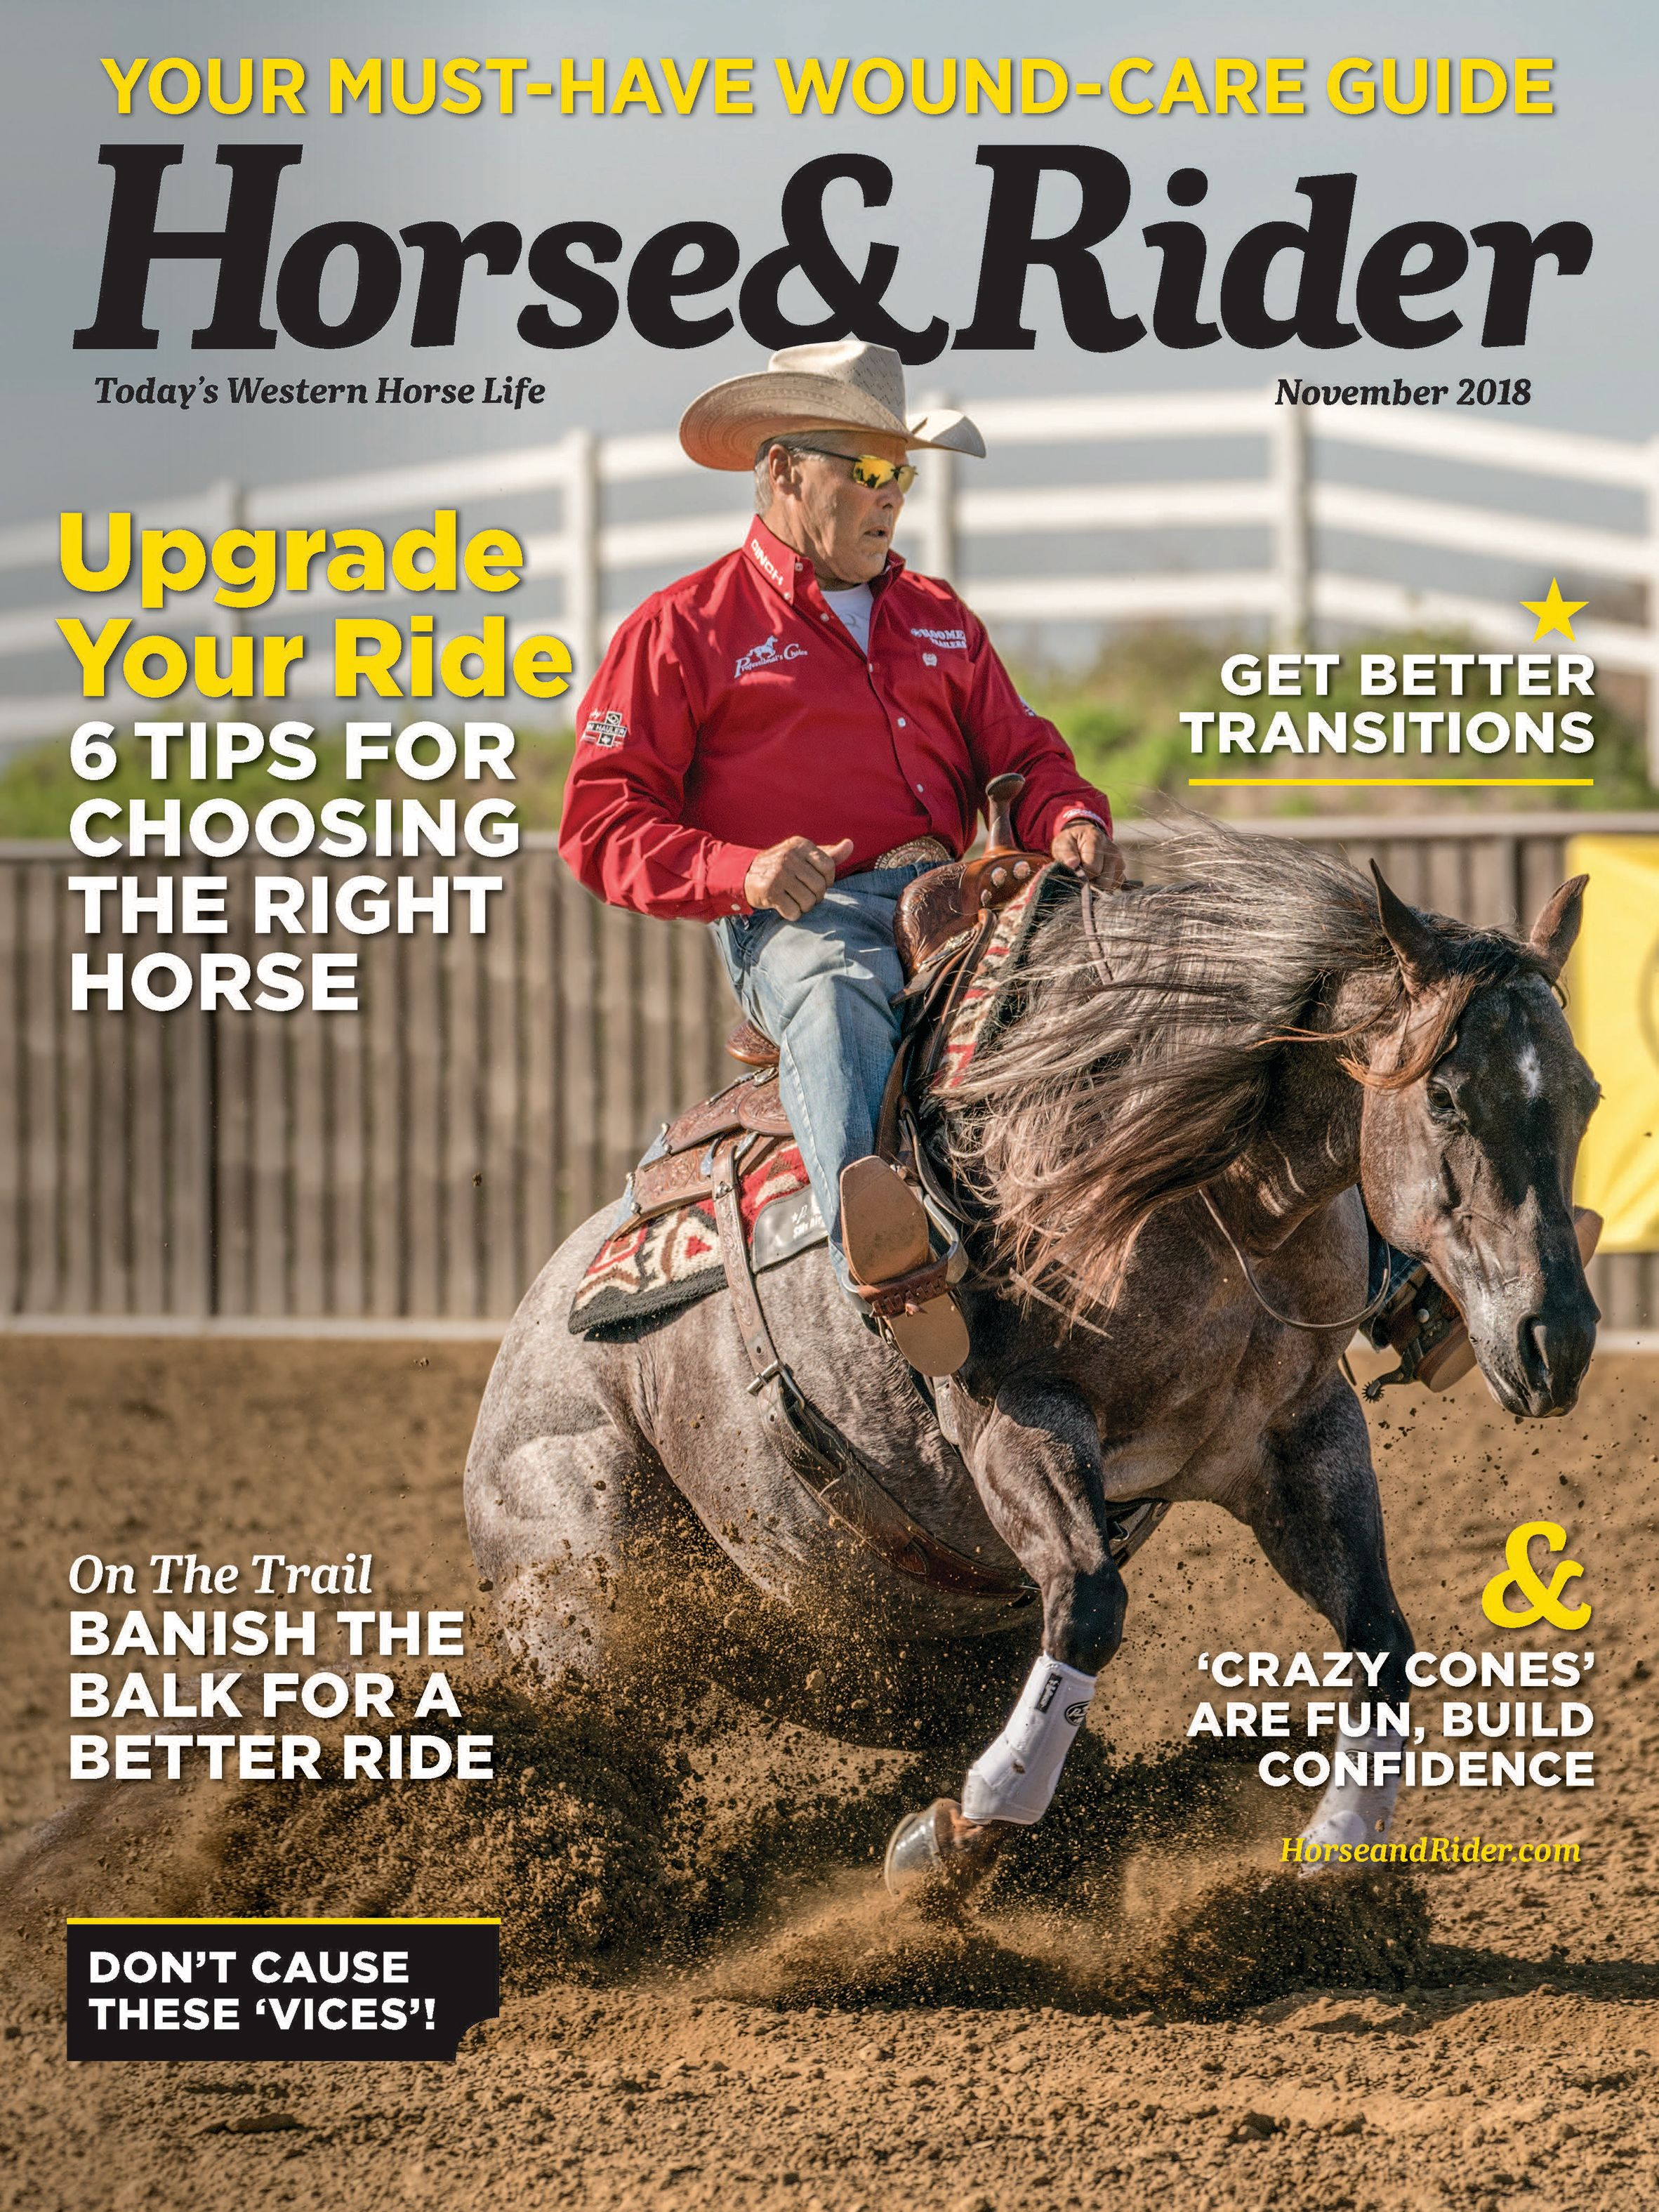 Horse&Rider | November 2018 Isssue